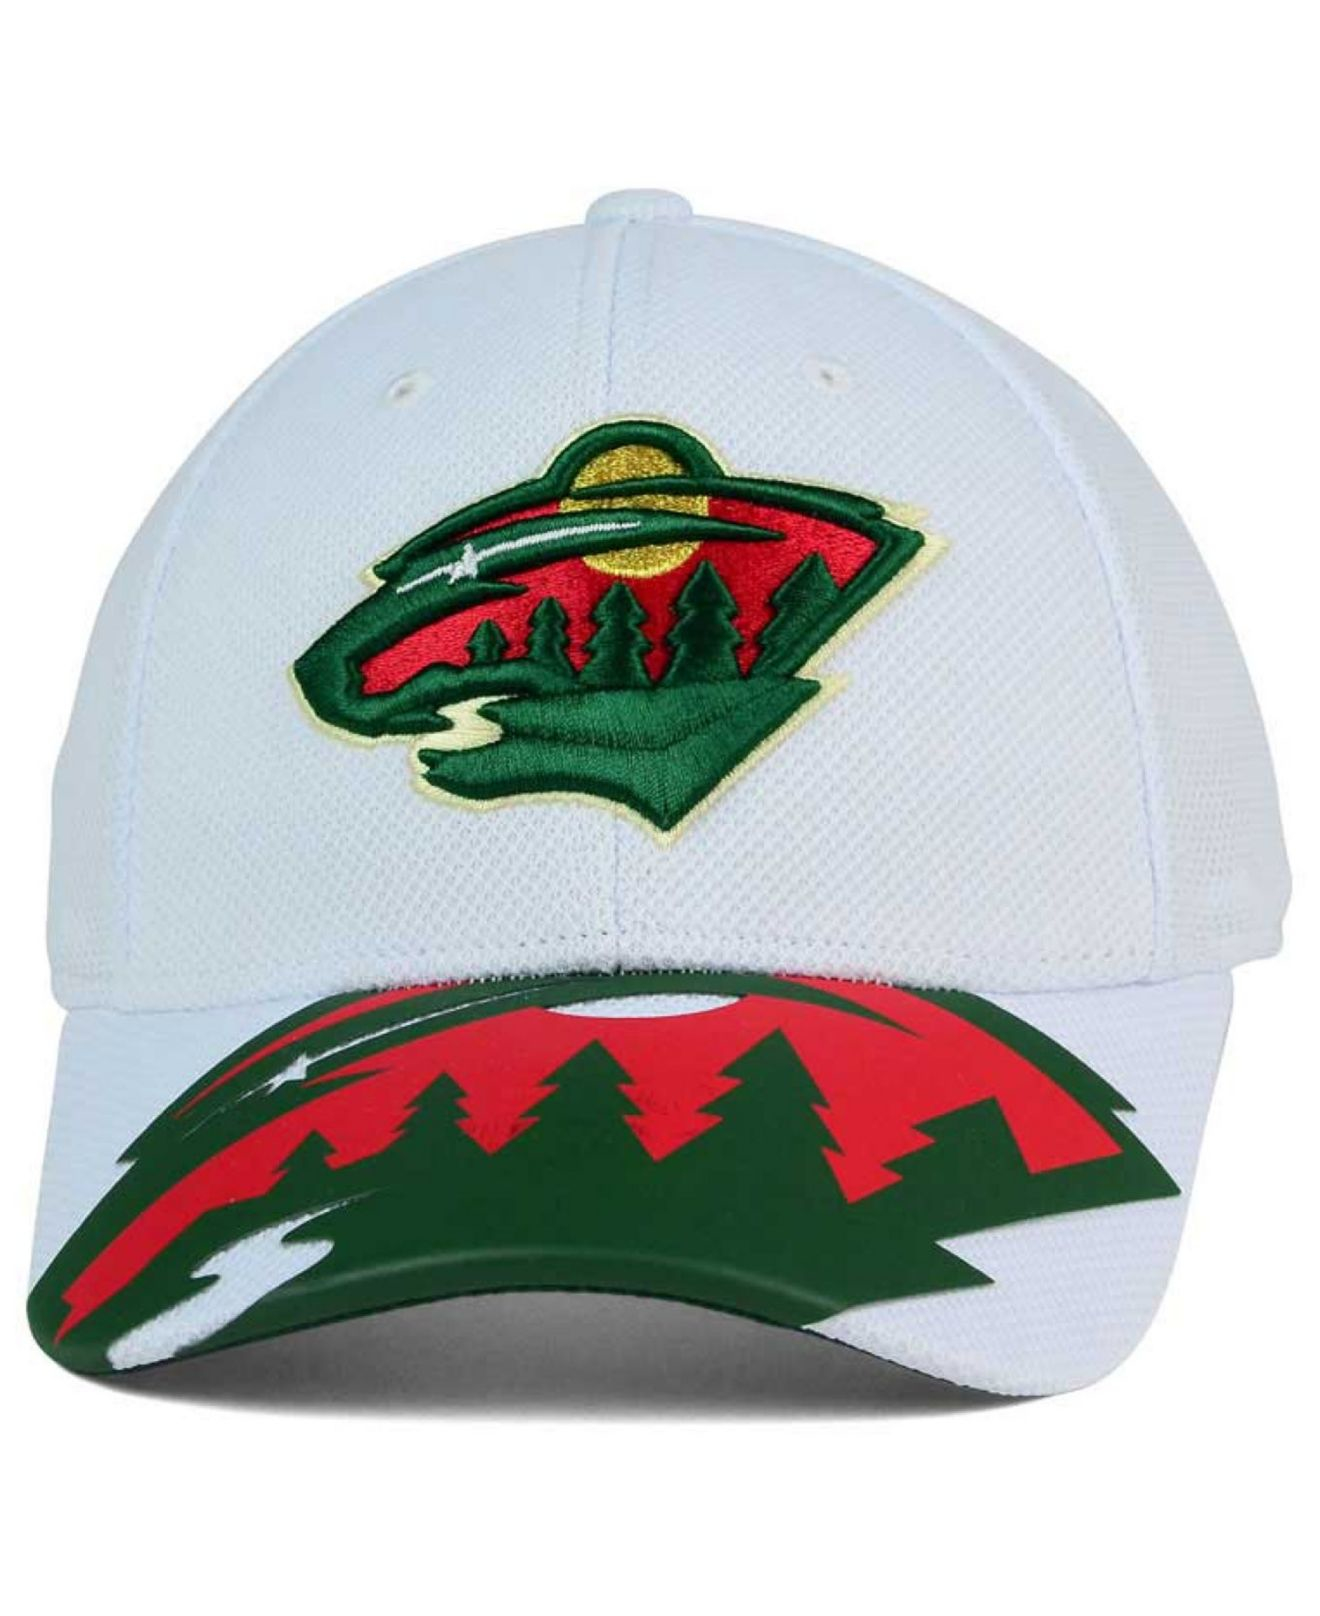 8721127ba86 ... cheap lyst reebok minnesota wild 2nd season draft flex cap in white for  men 4f634 382ec